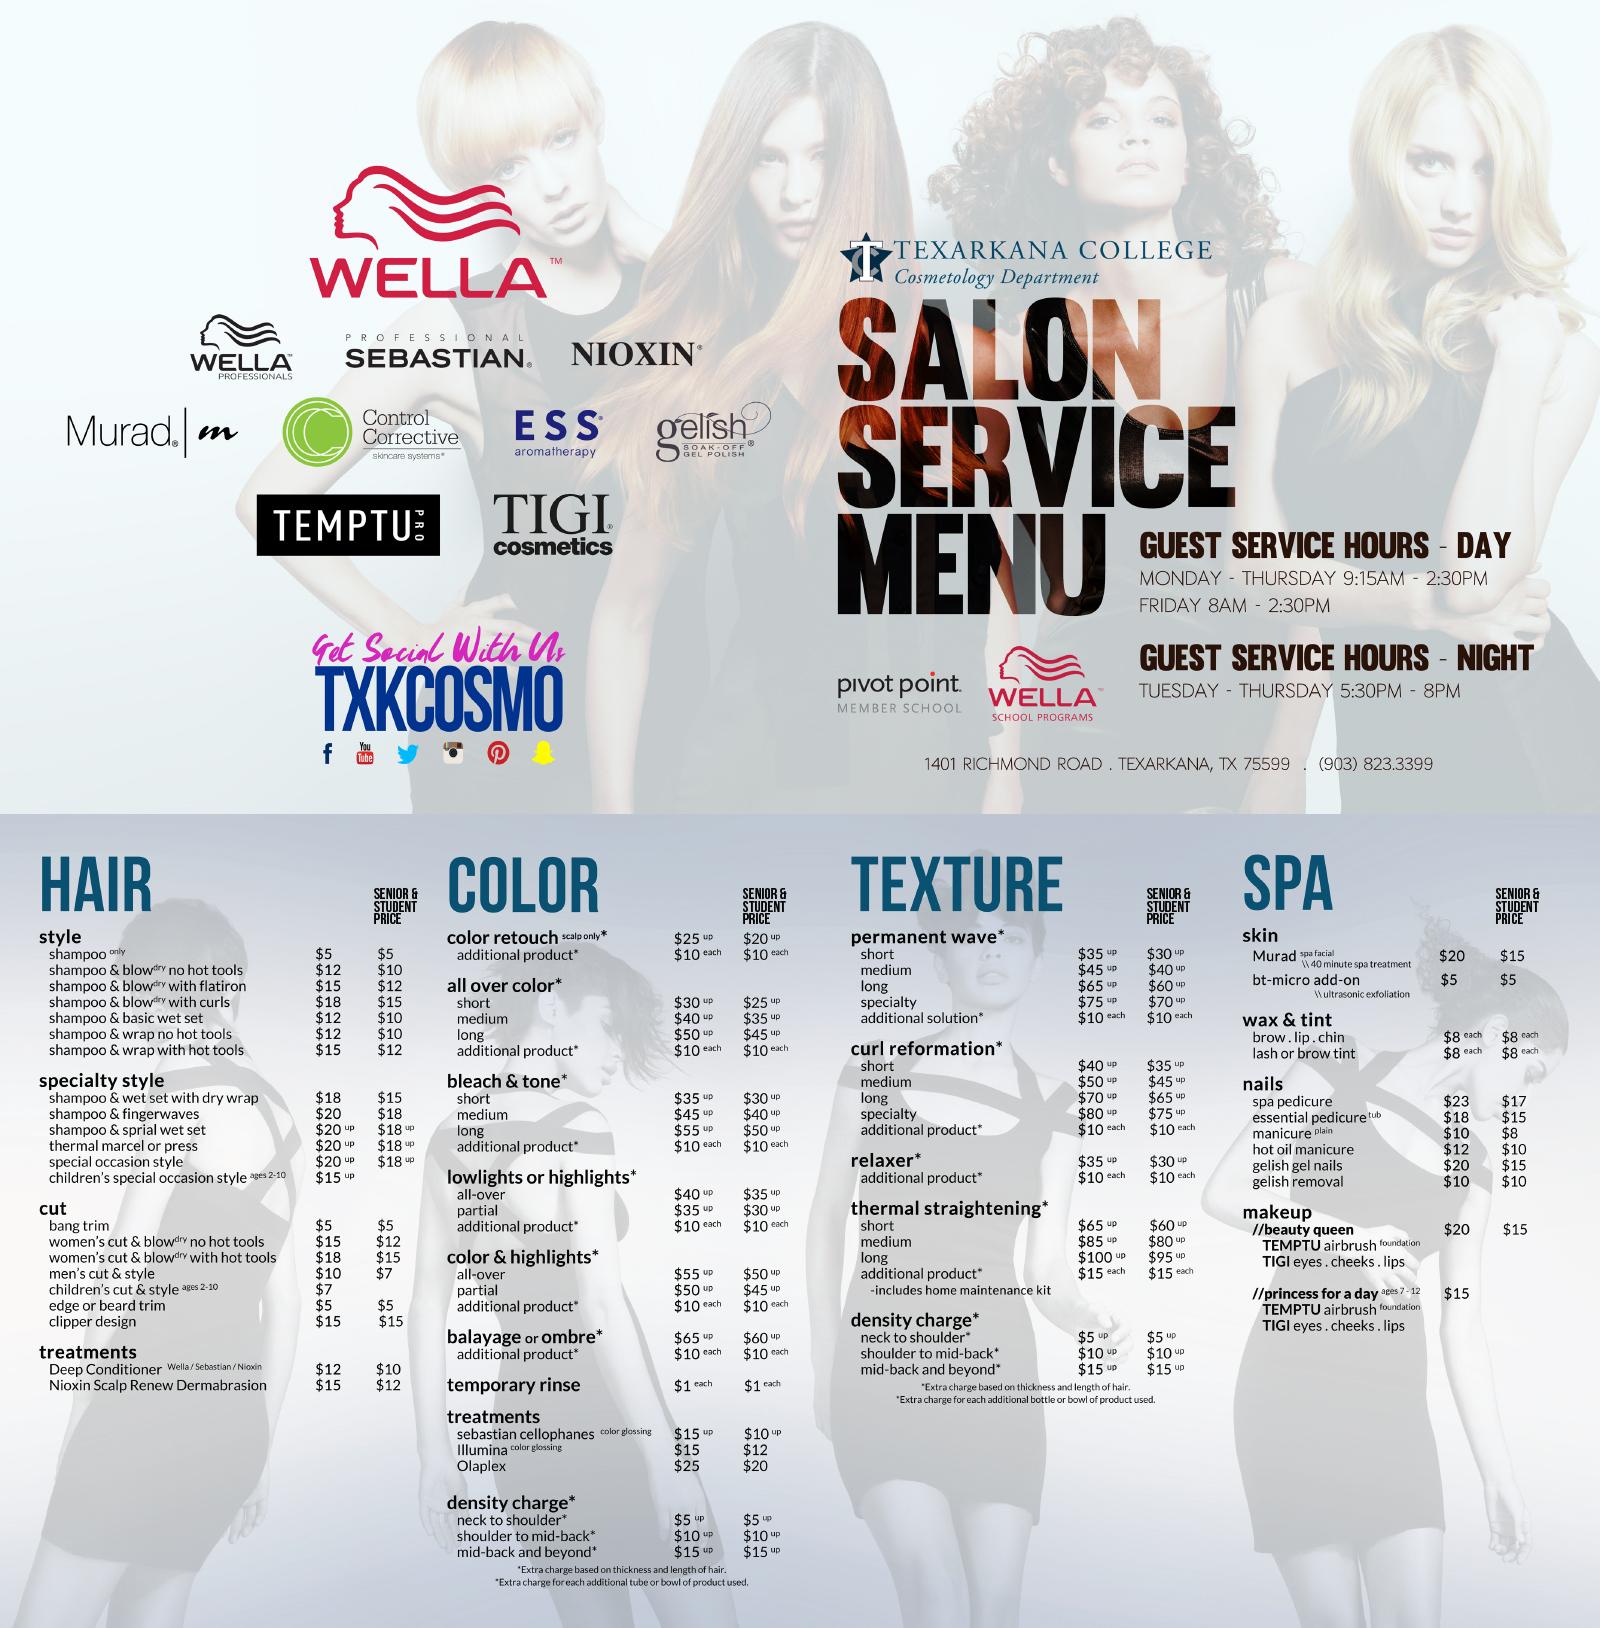 Cosmetology Salon Service Menu 2016-2017